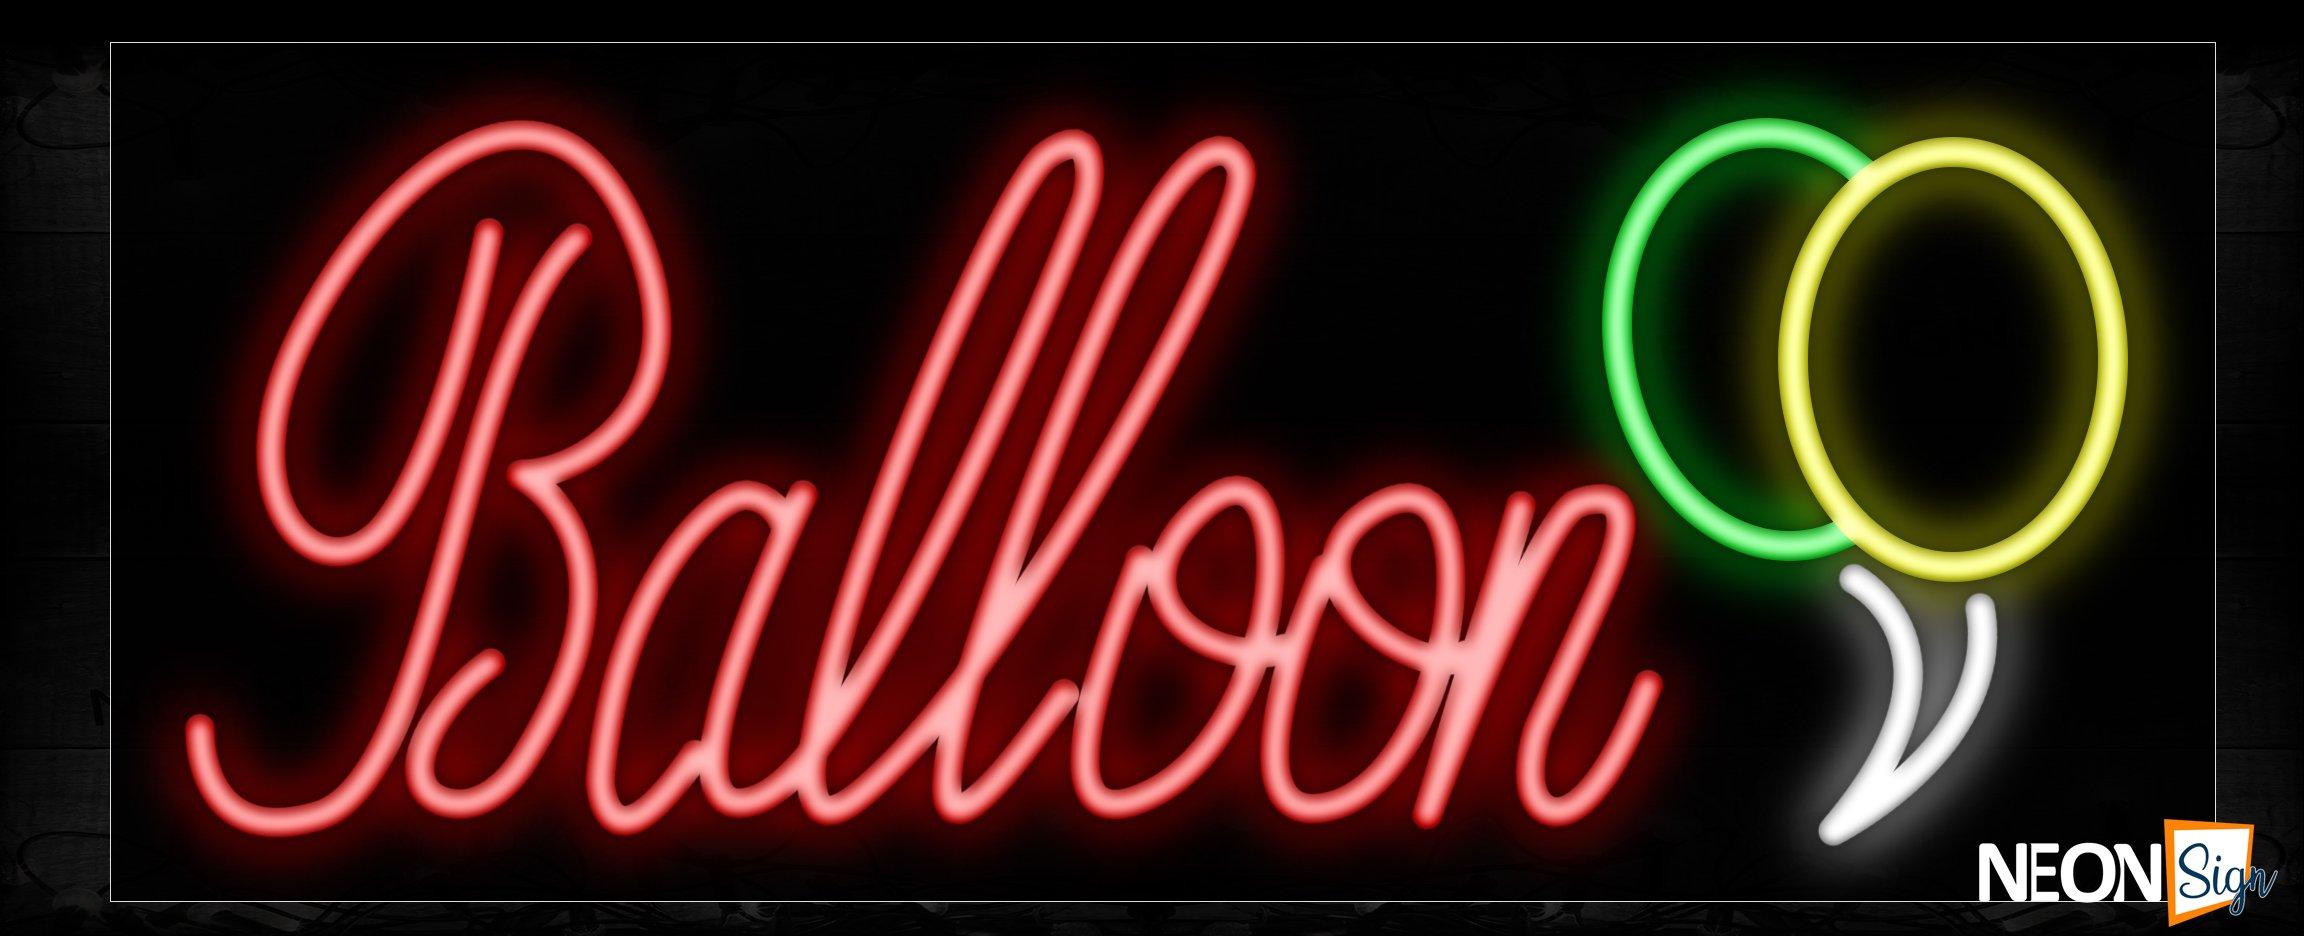 Image of 10501 Balloon Traditional Neon_13x32 Black Backing